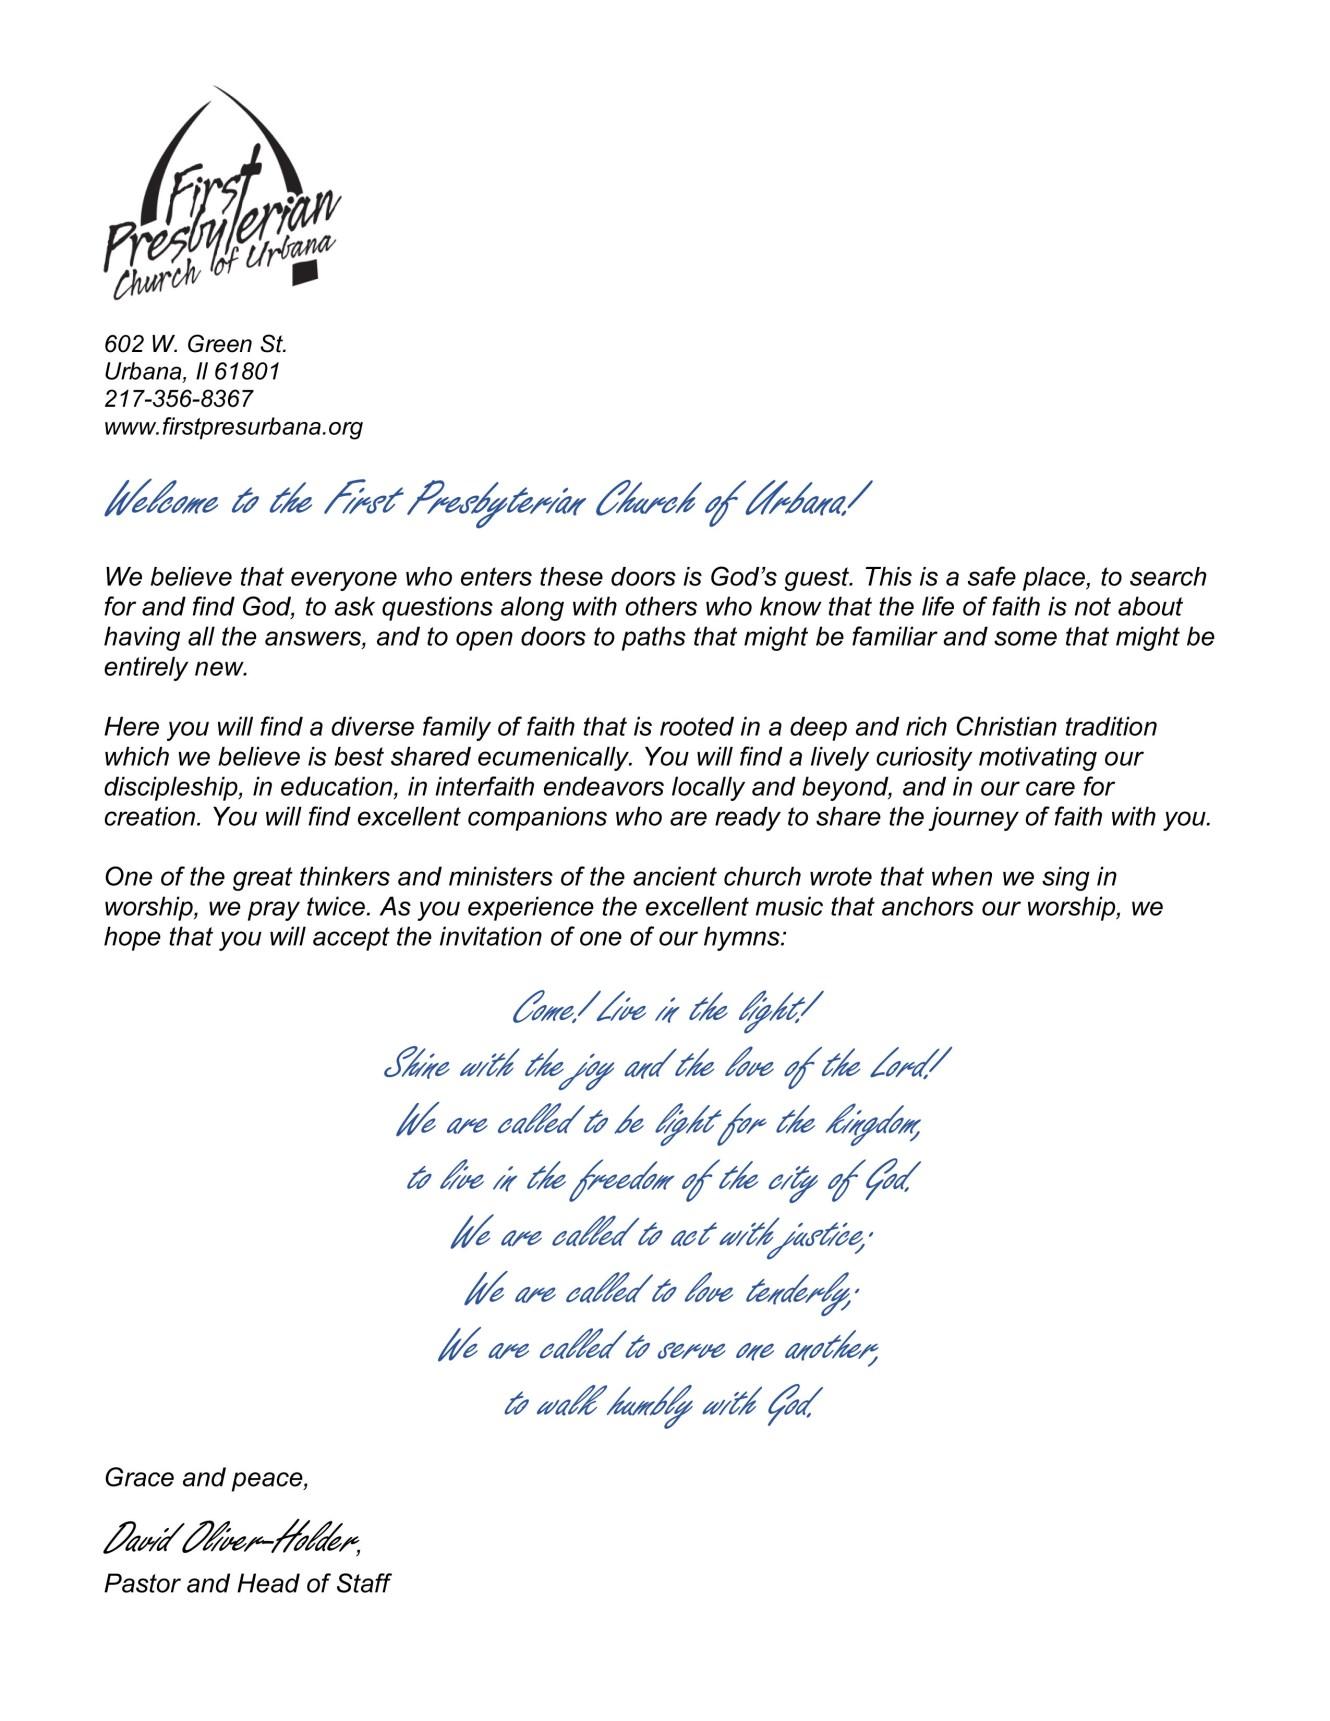 Welcome letter first presbyterian urbana altavistaventures Images